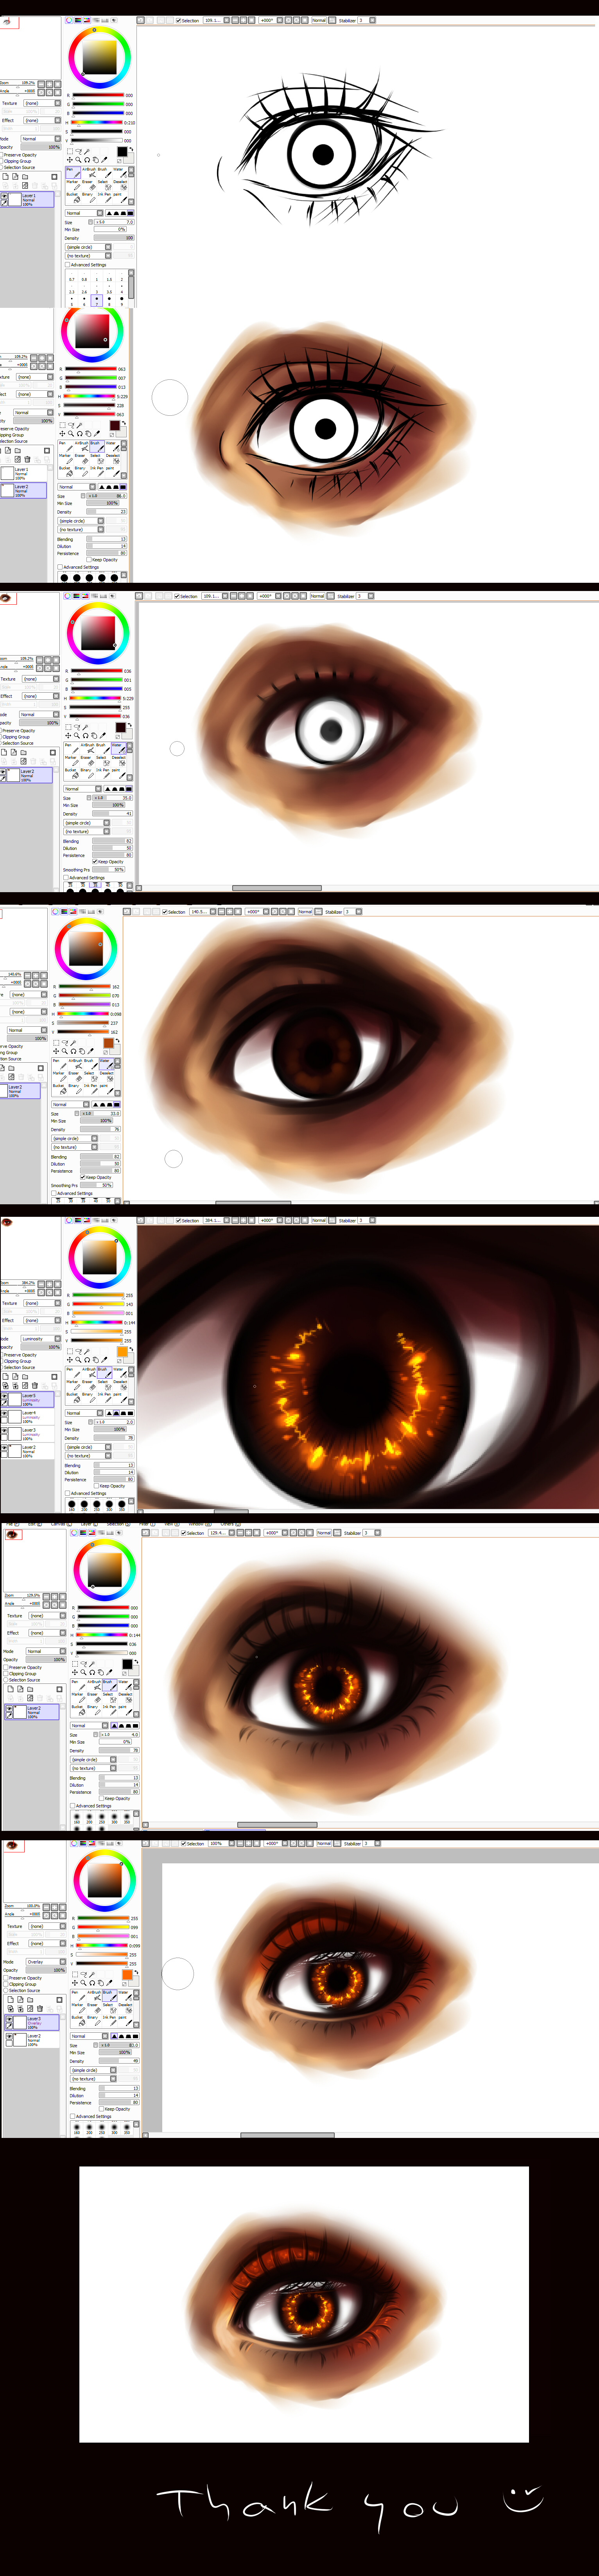 Paint tool sai eye tutorial by ryky on deviantart paint tool sai eye tutorial by ryky ccuart Images